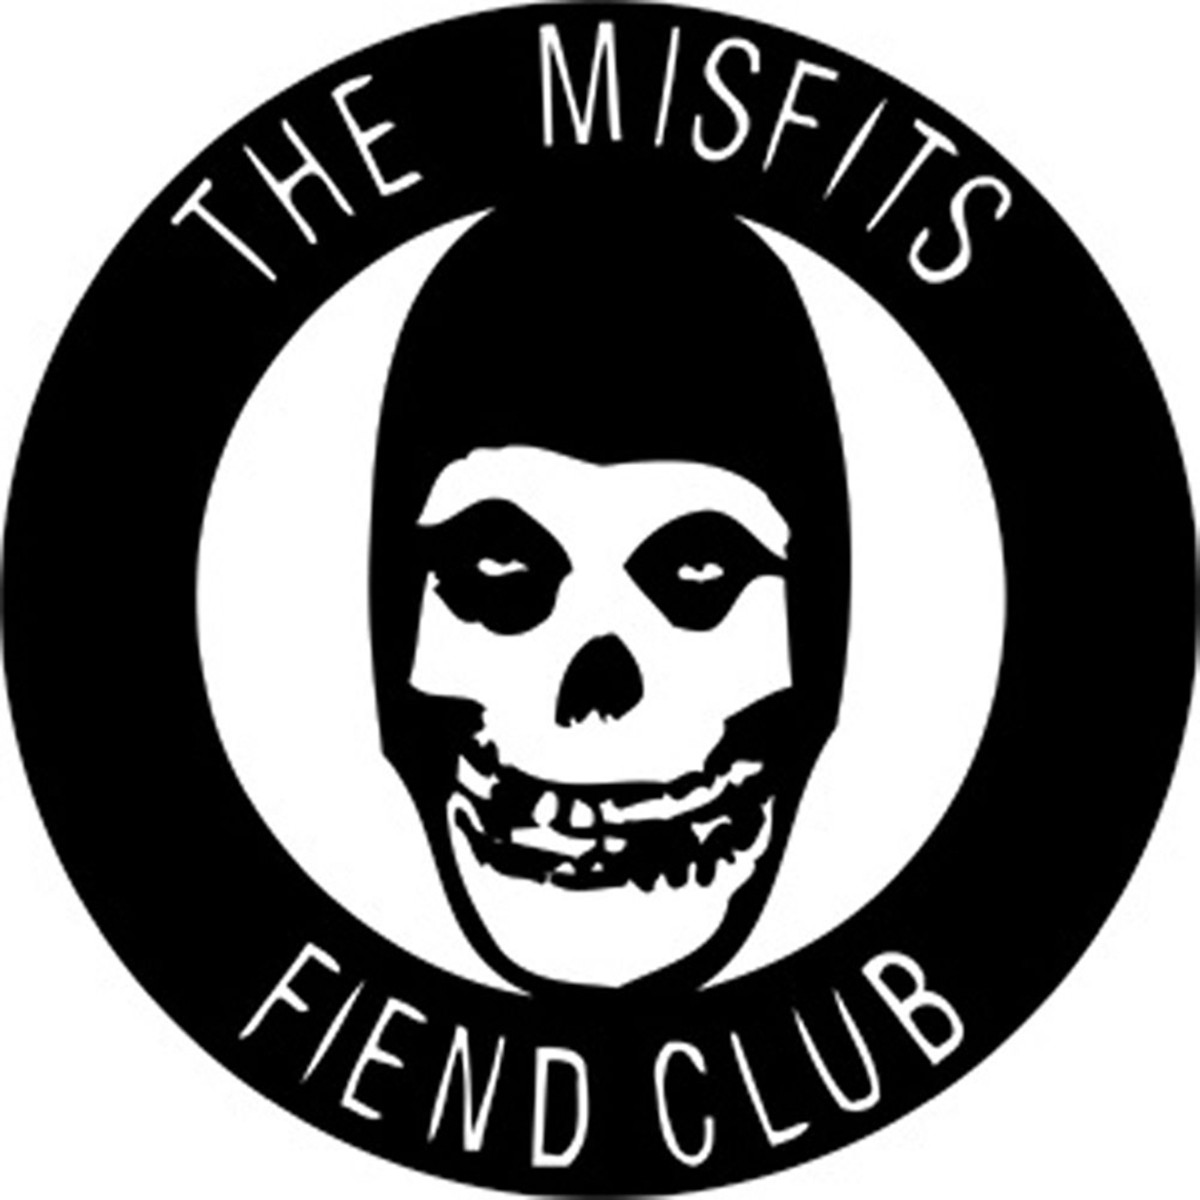 gal_drink_the-misfits-fiend-club-rub-on-sticker-s3380r.jpg